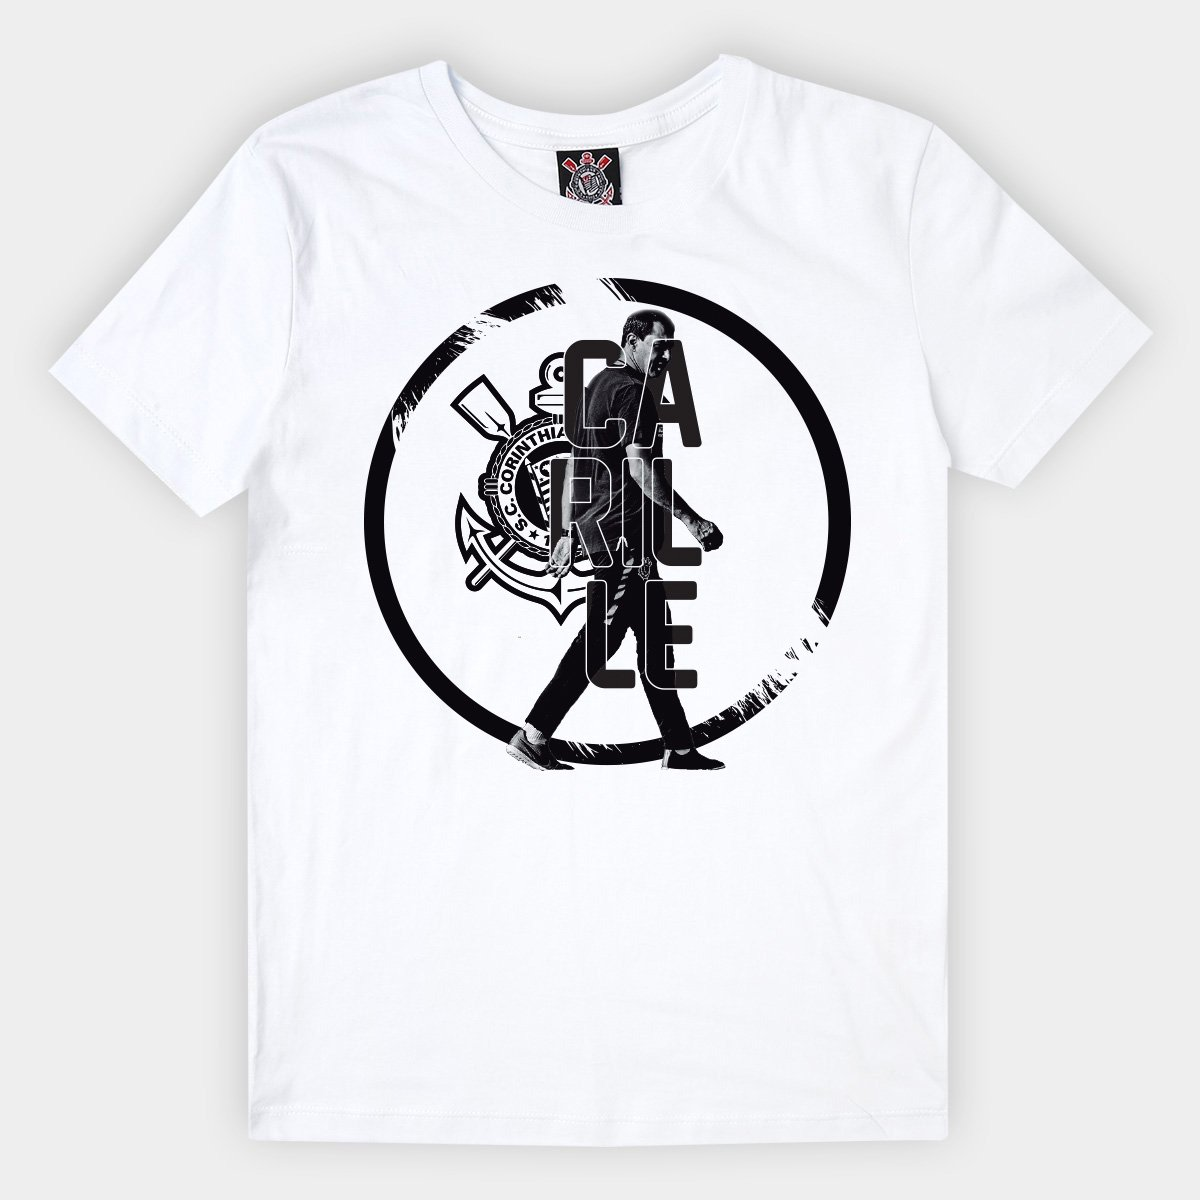 10bd7a40a4 Camiseta Infantil Corinthians Carille - Branco - Compre Agora